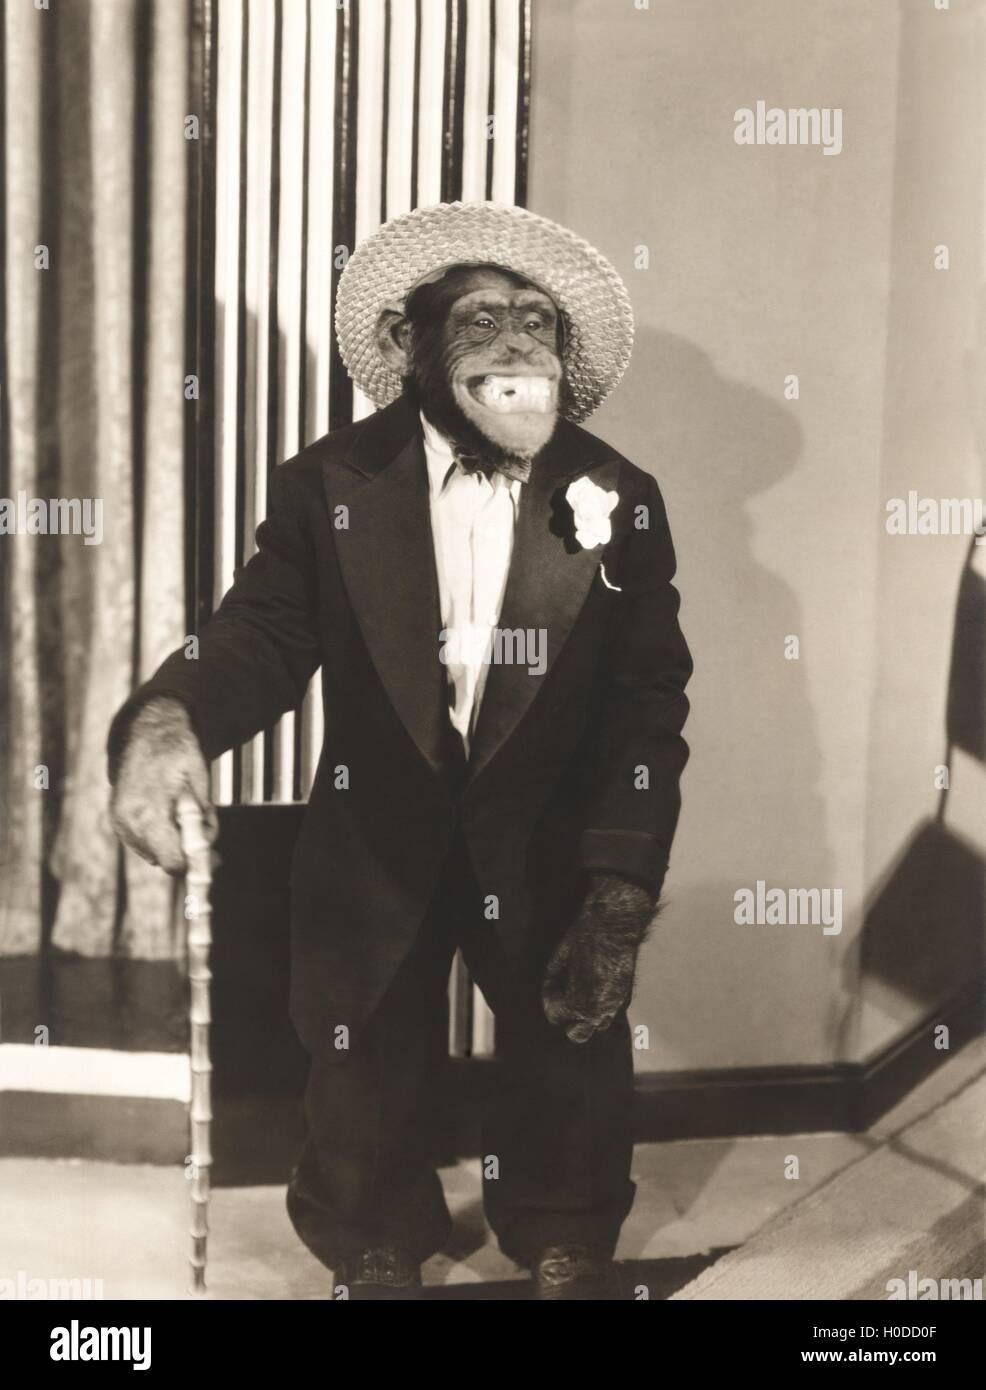 Grinning monkey in tuxedo - Stock Image